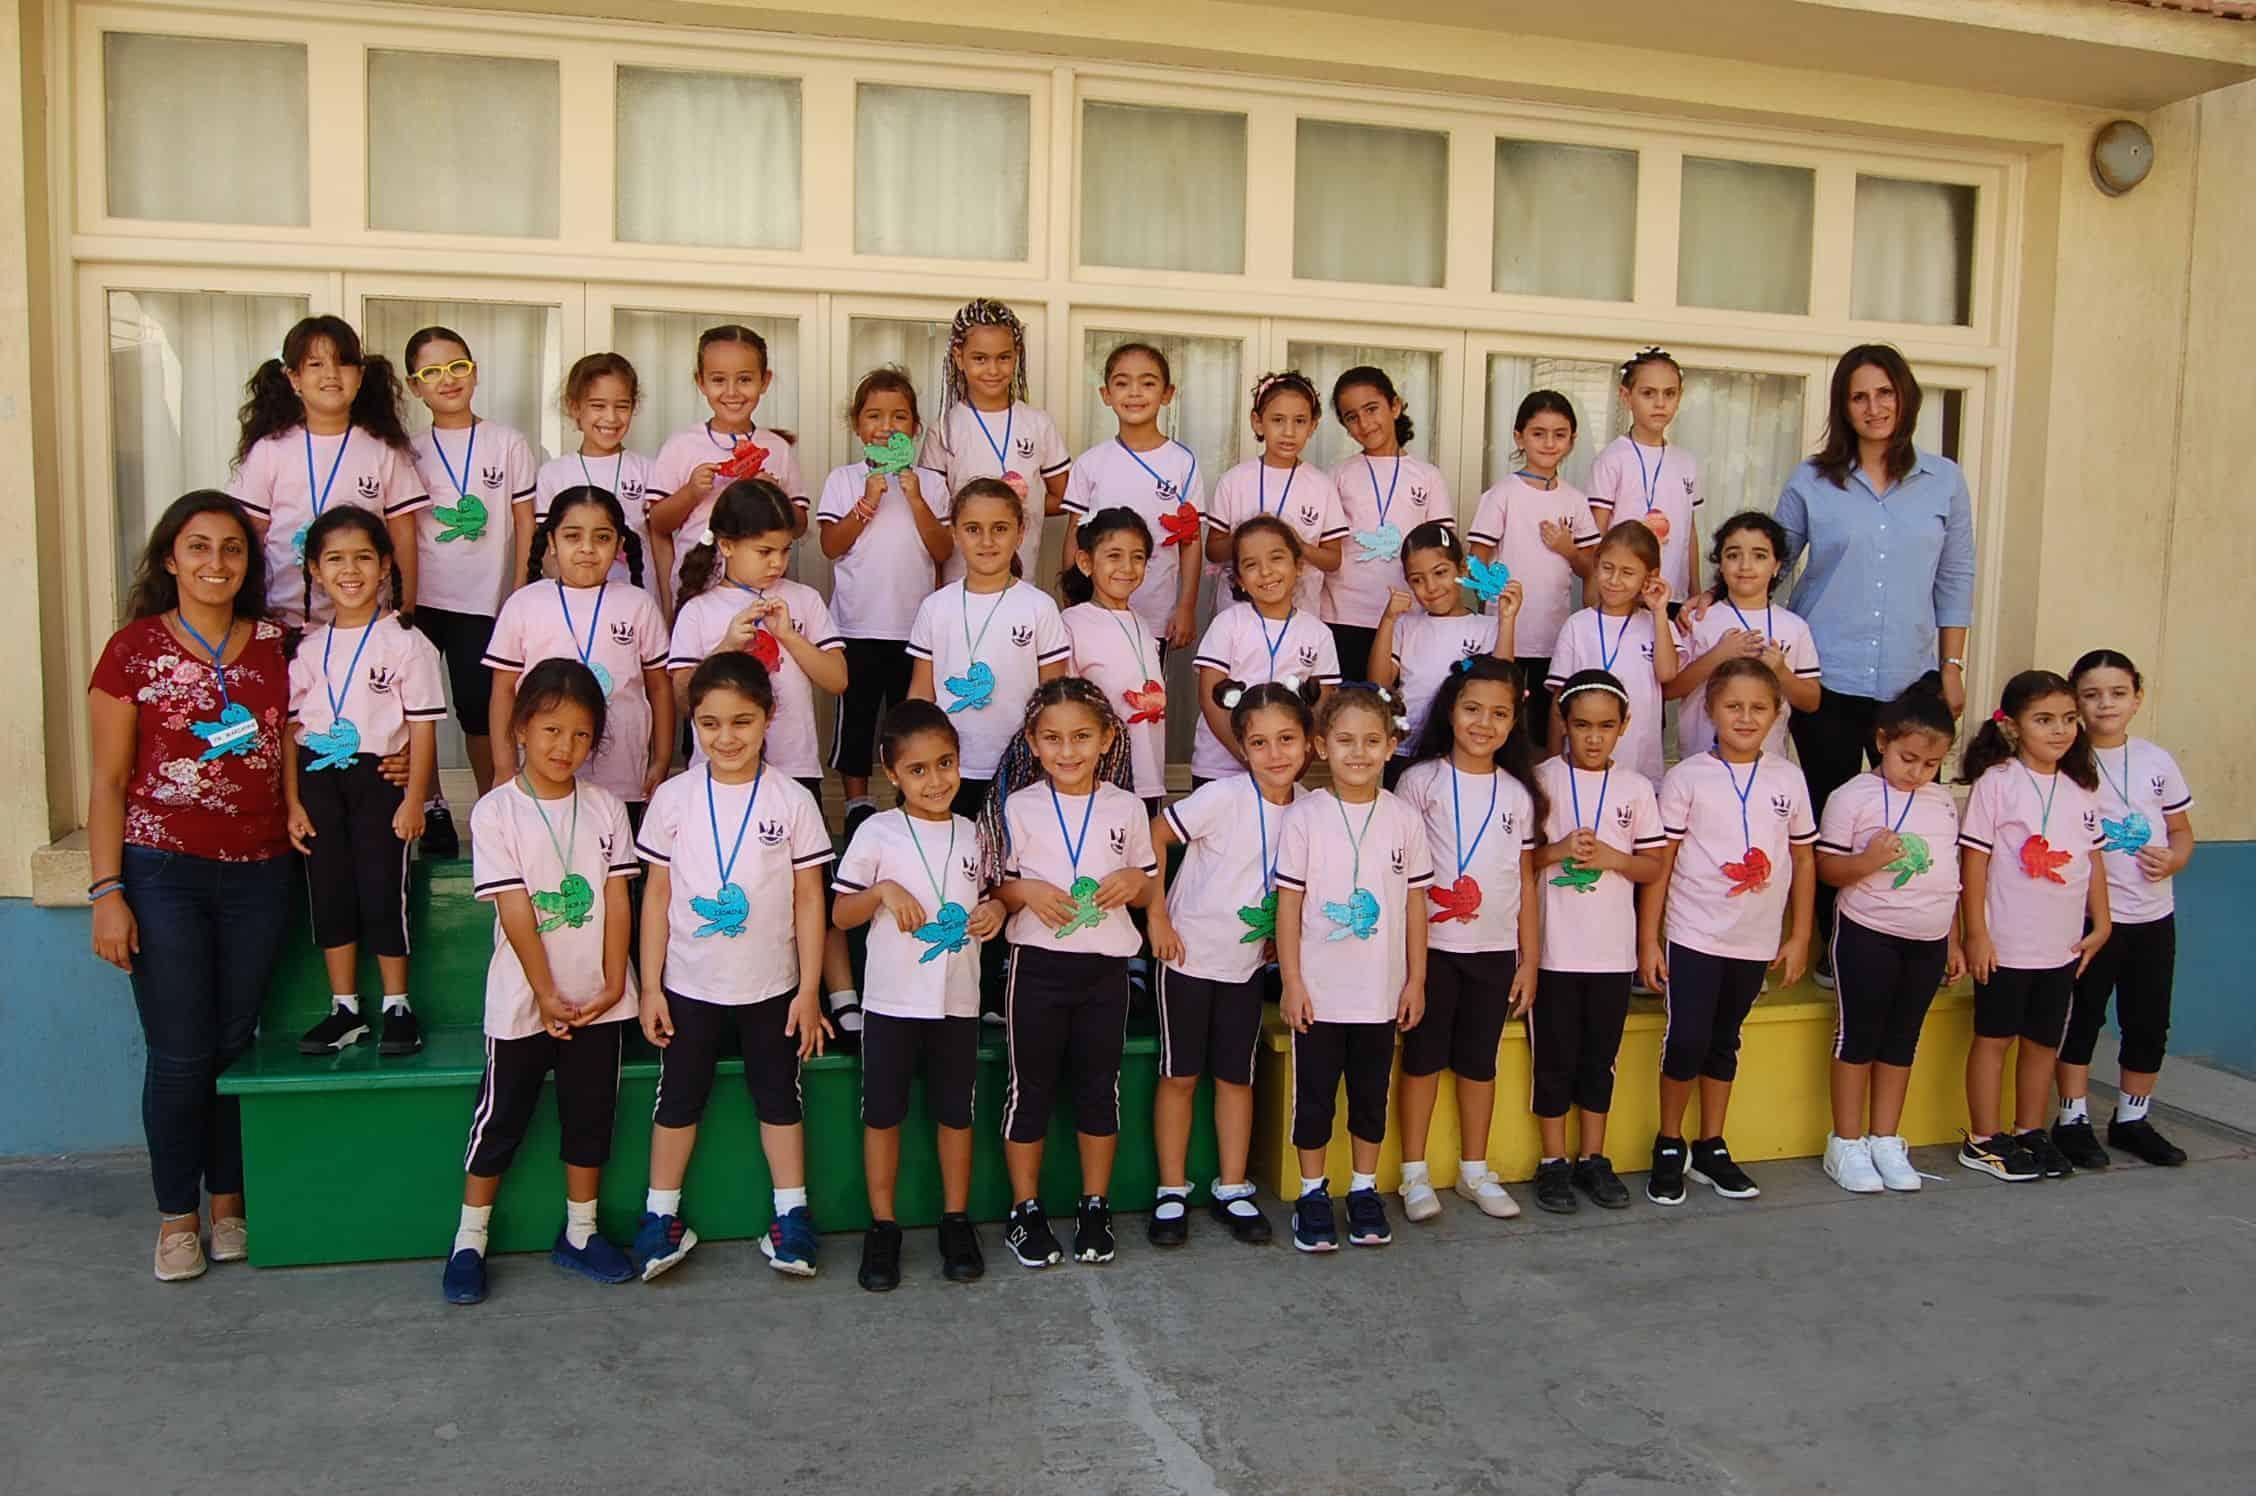 Vorschule Gruppe A